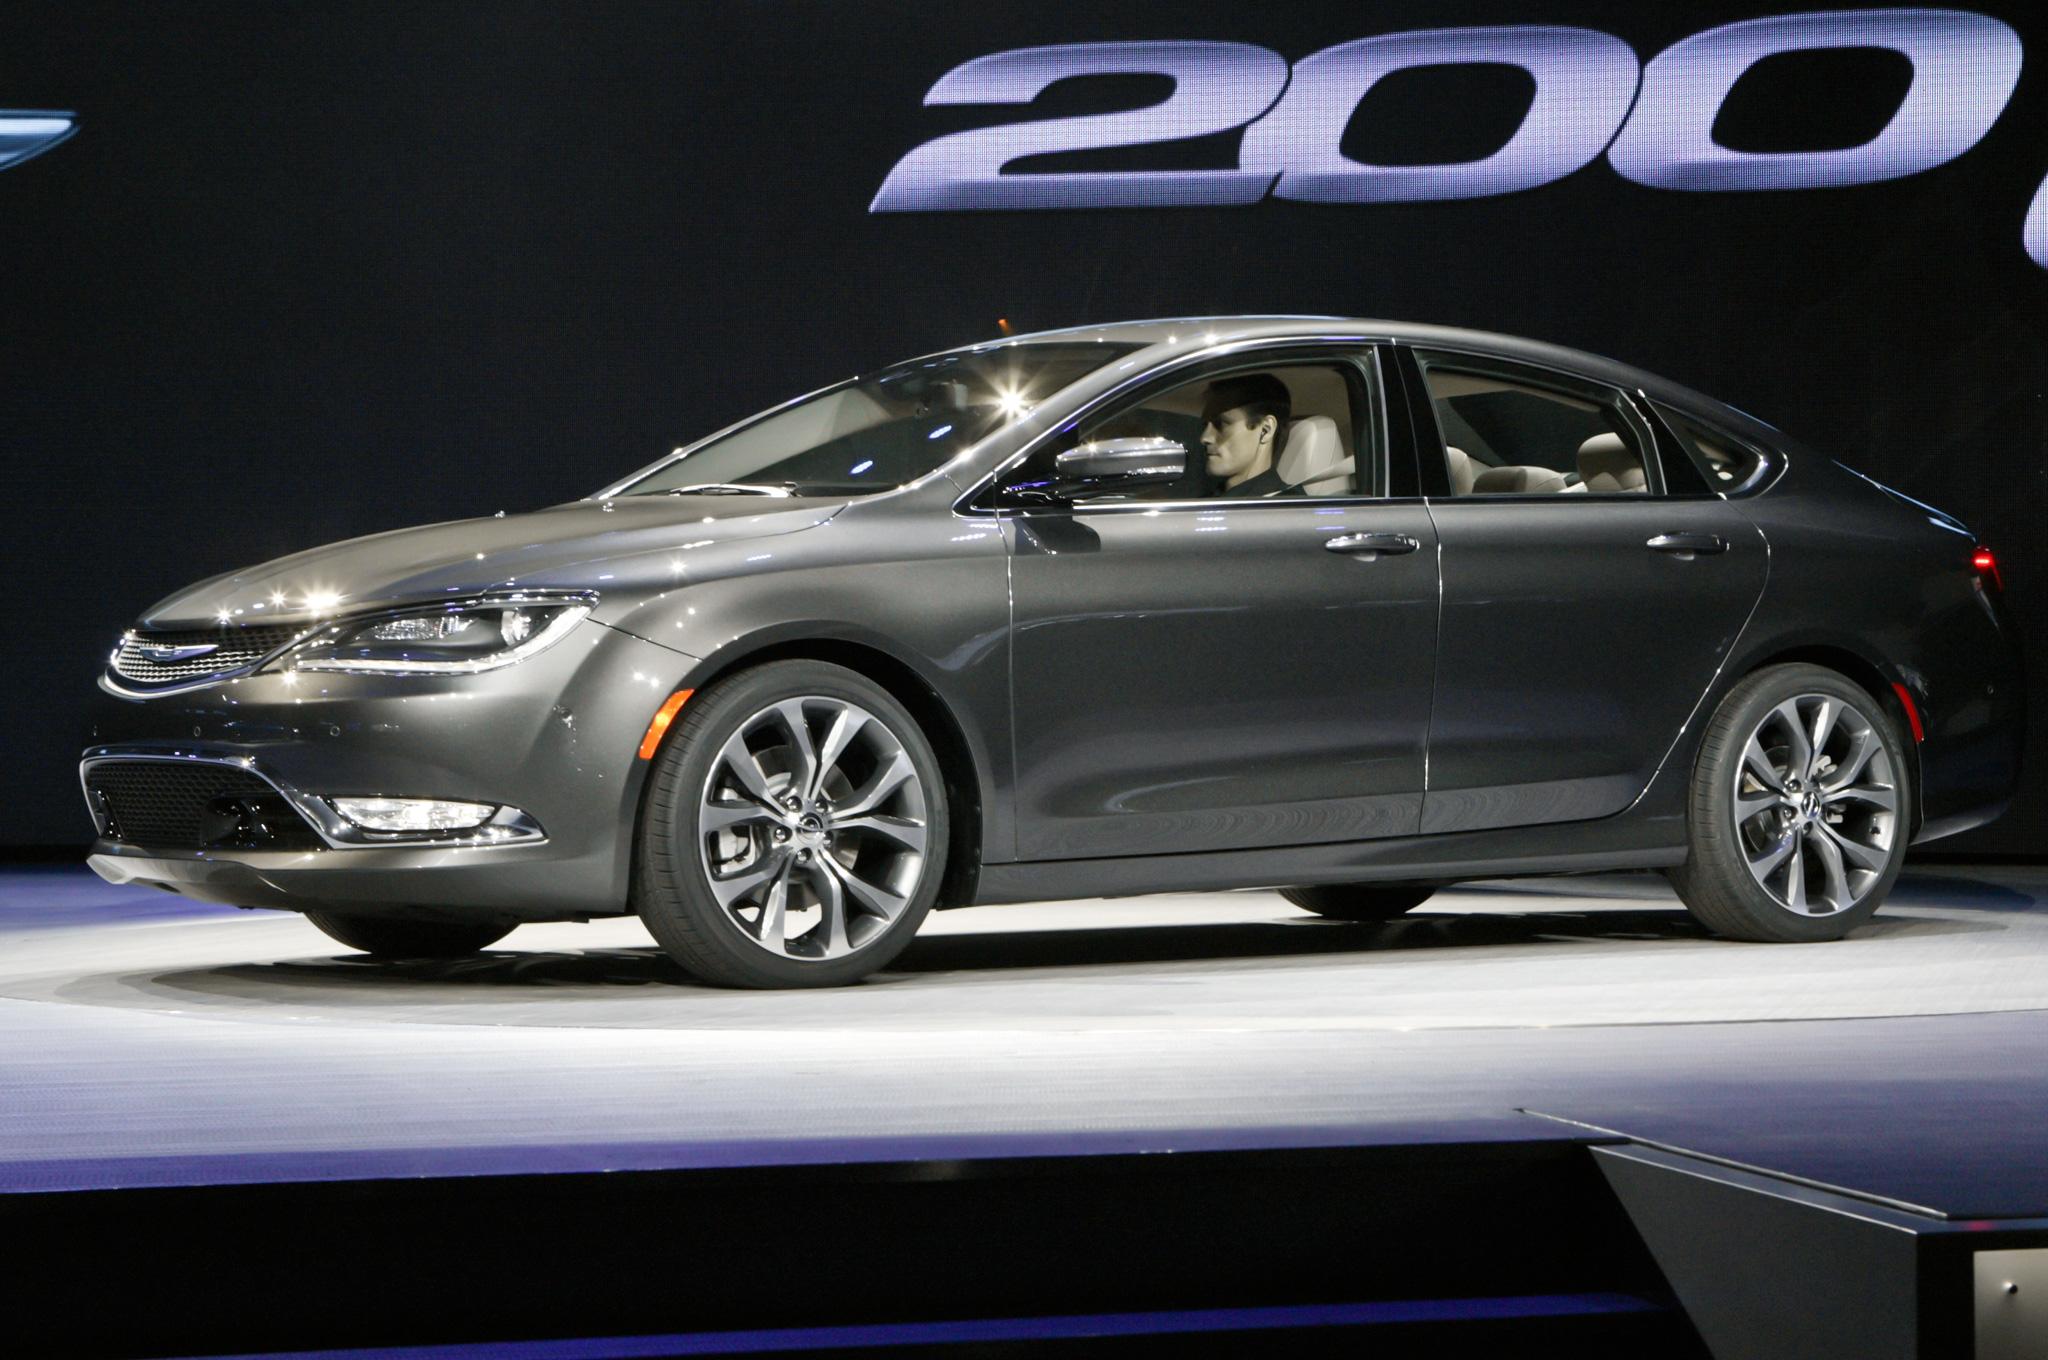 2015 Chrysler 200 Side View